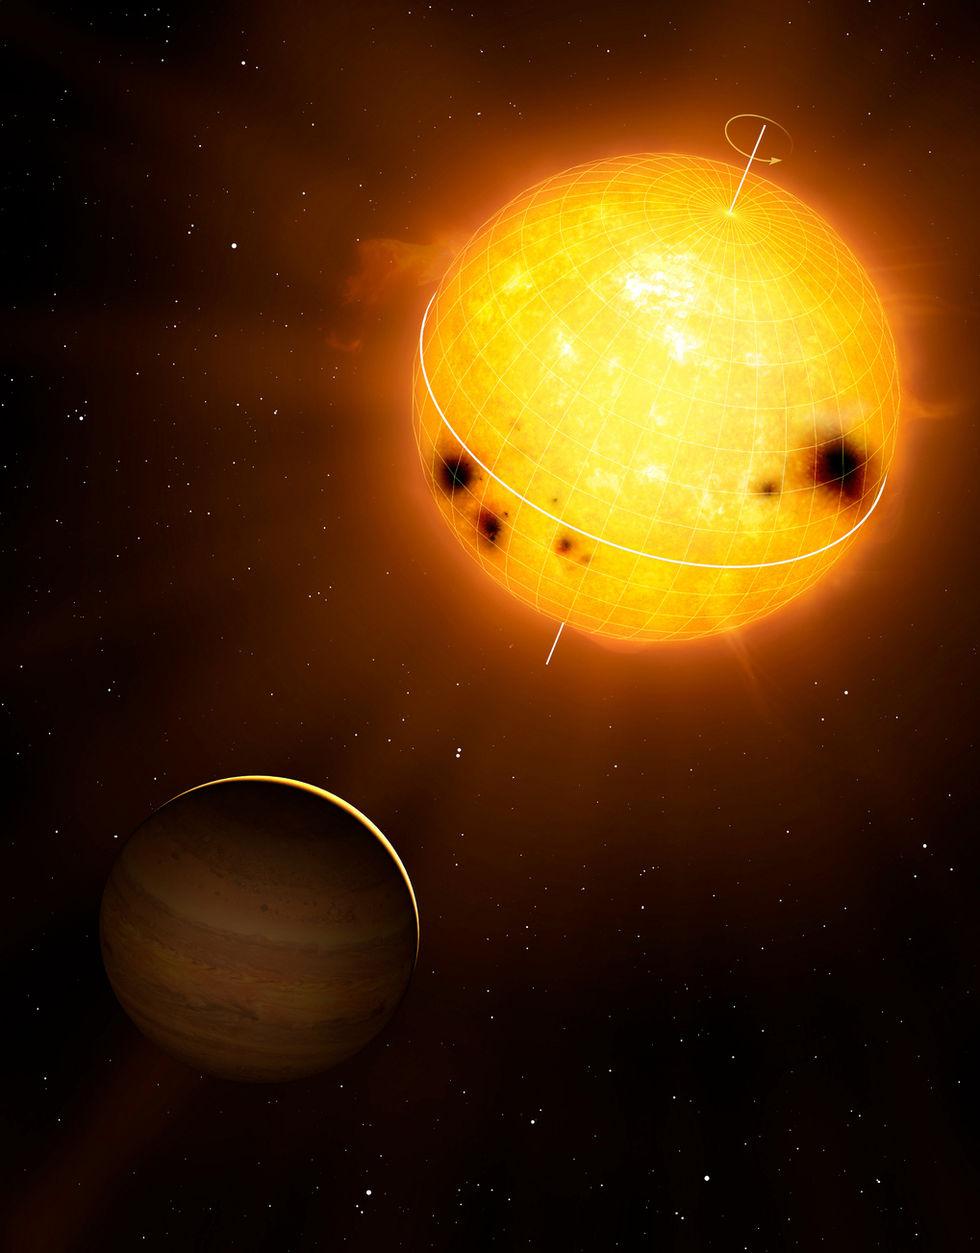 ESA ska börja leta efter beboeliga planeter 2026